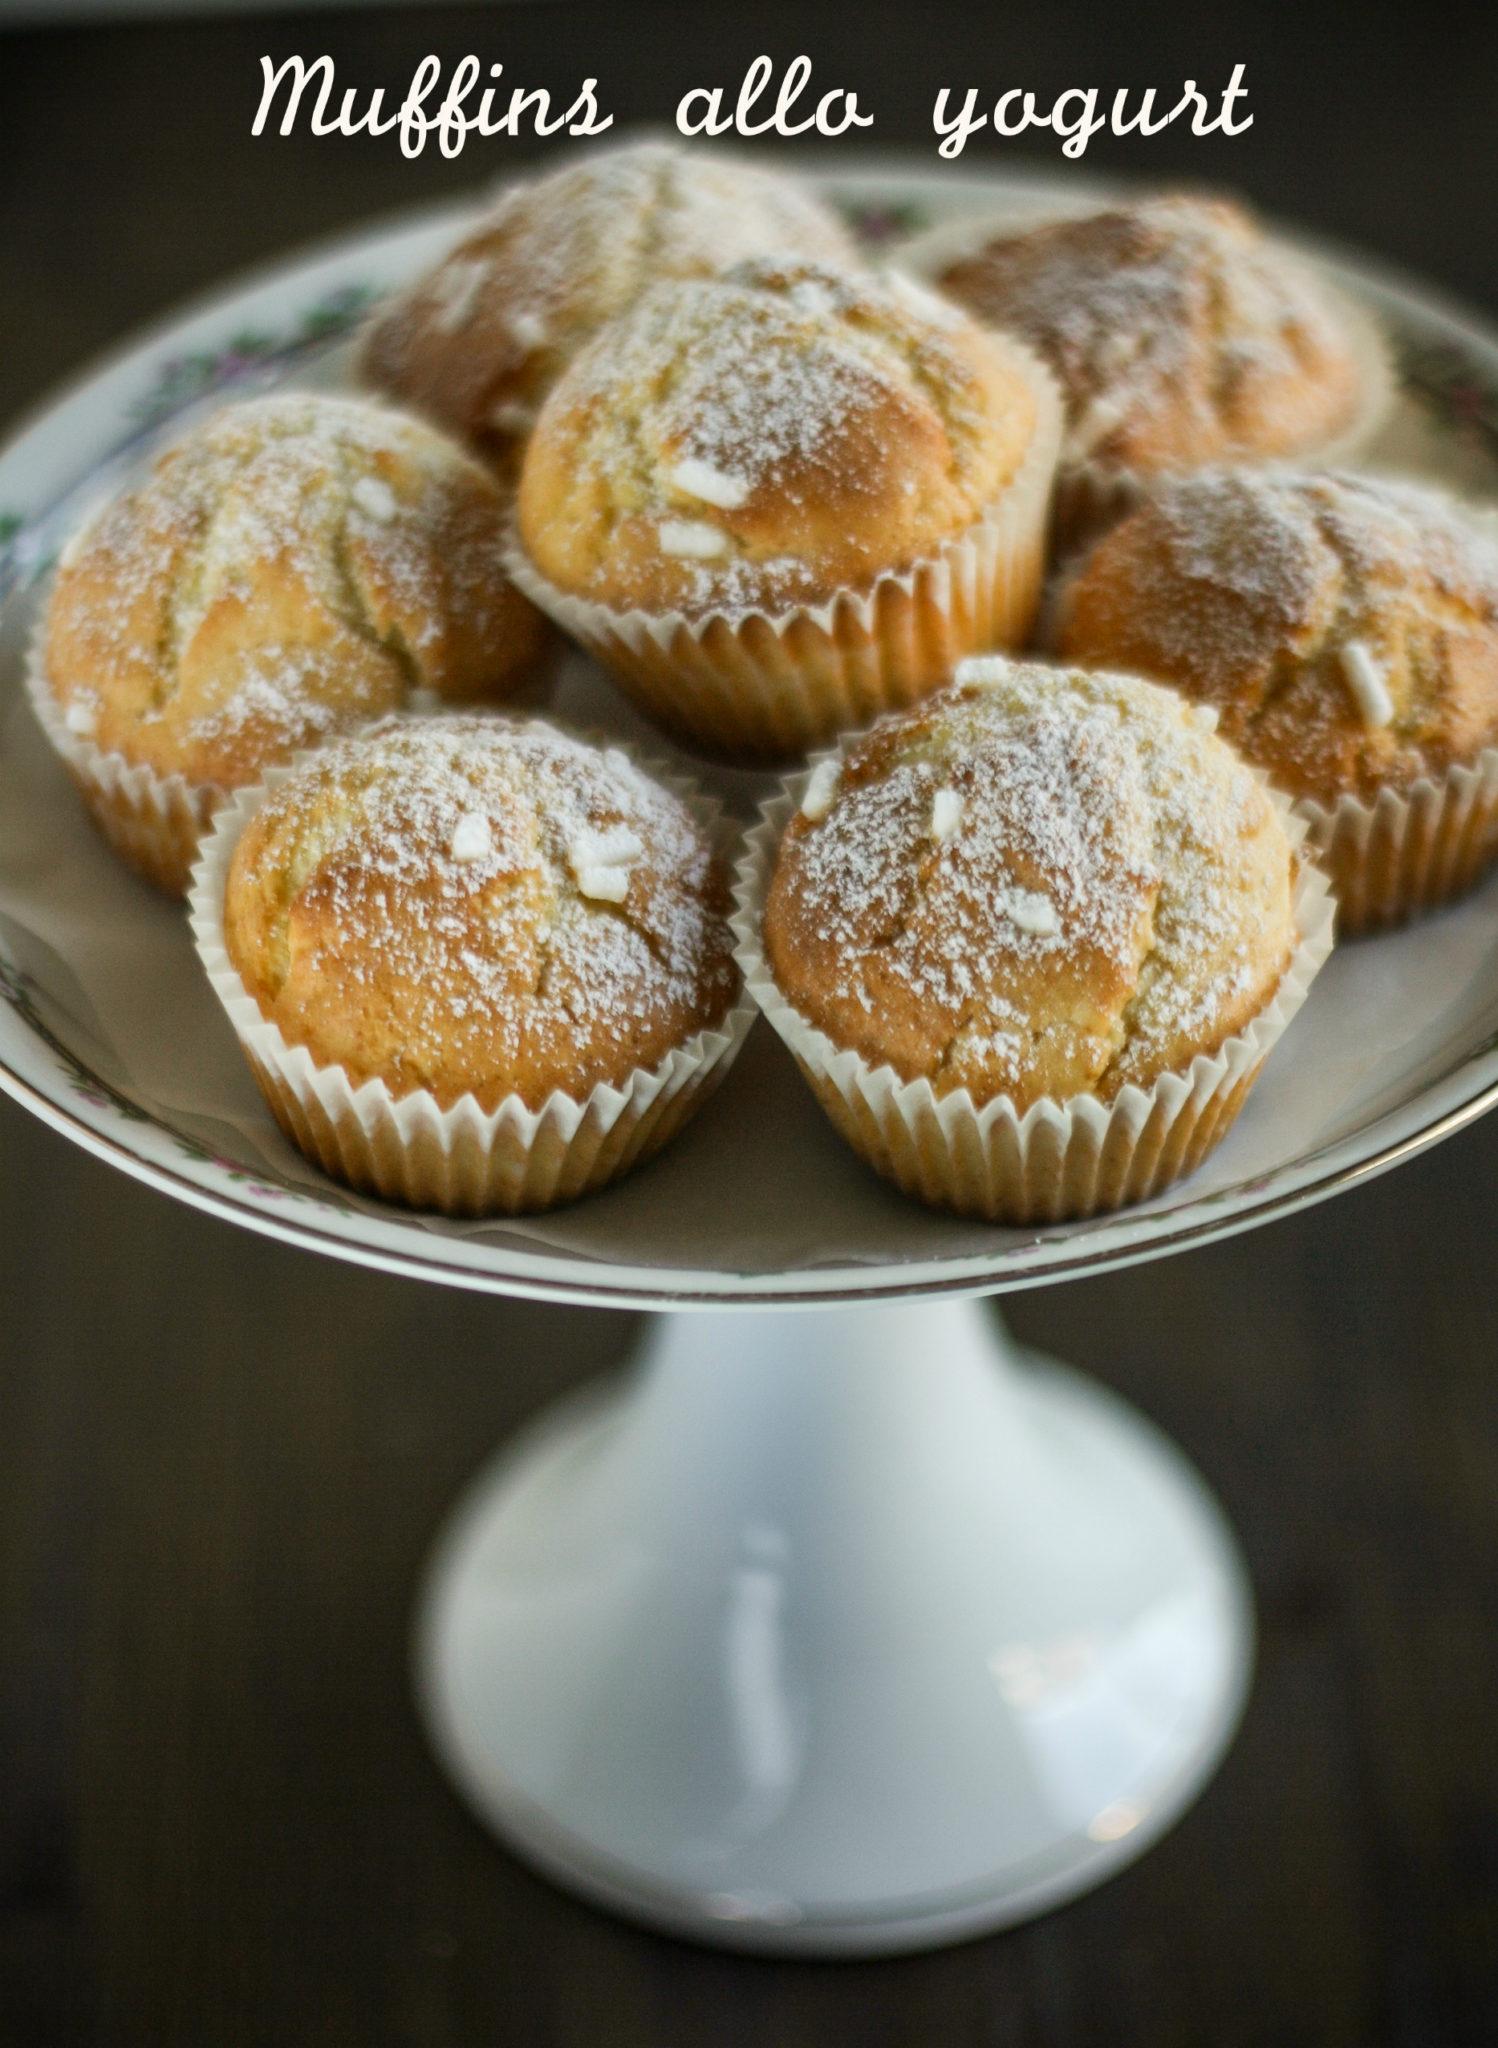 Muffins allo yogurt zucchero sale for Cucinare yogurt greco